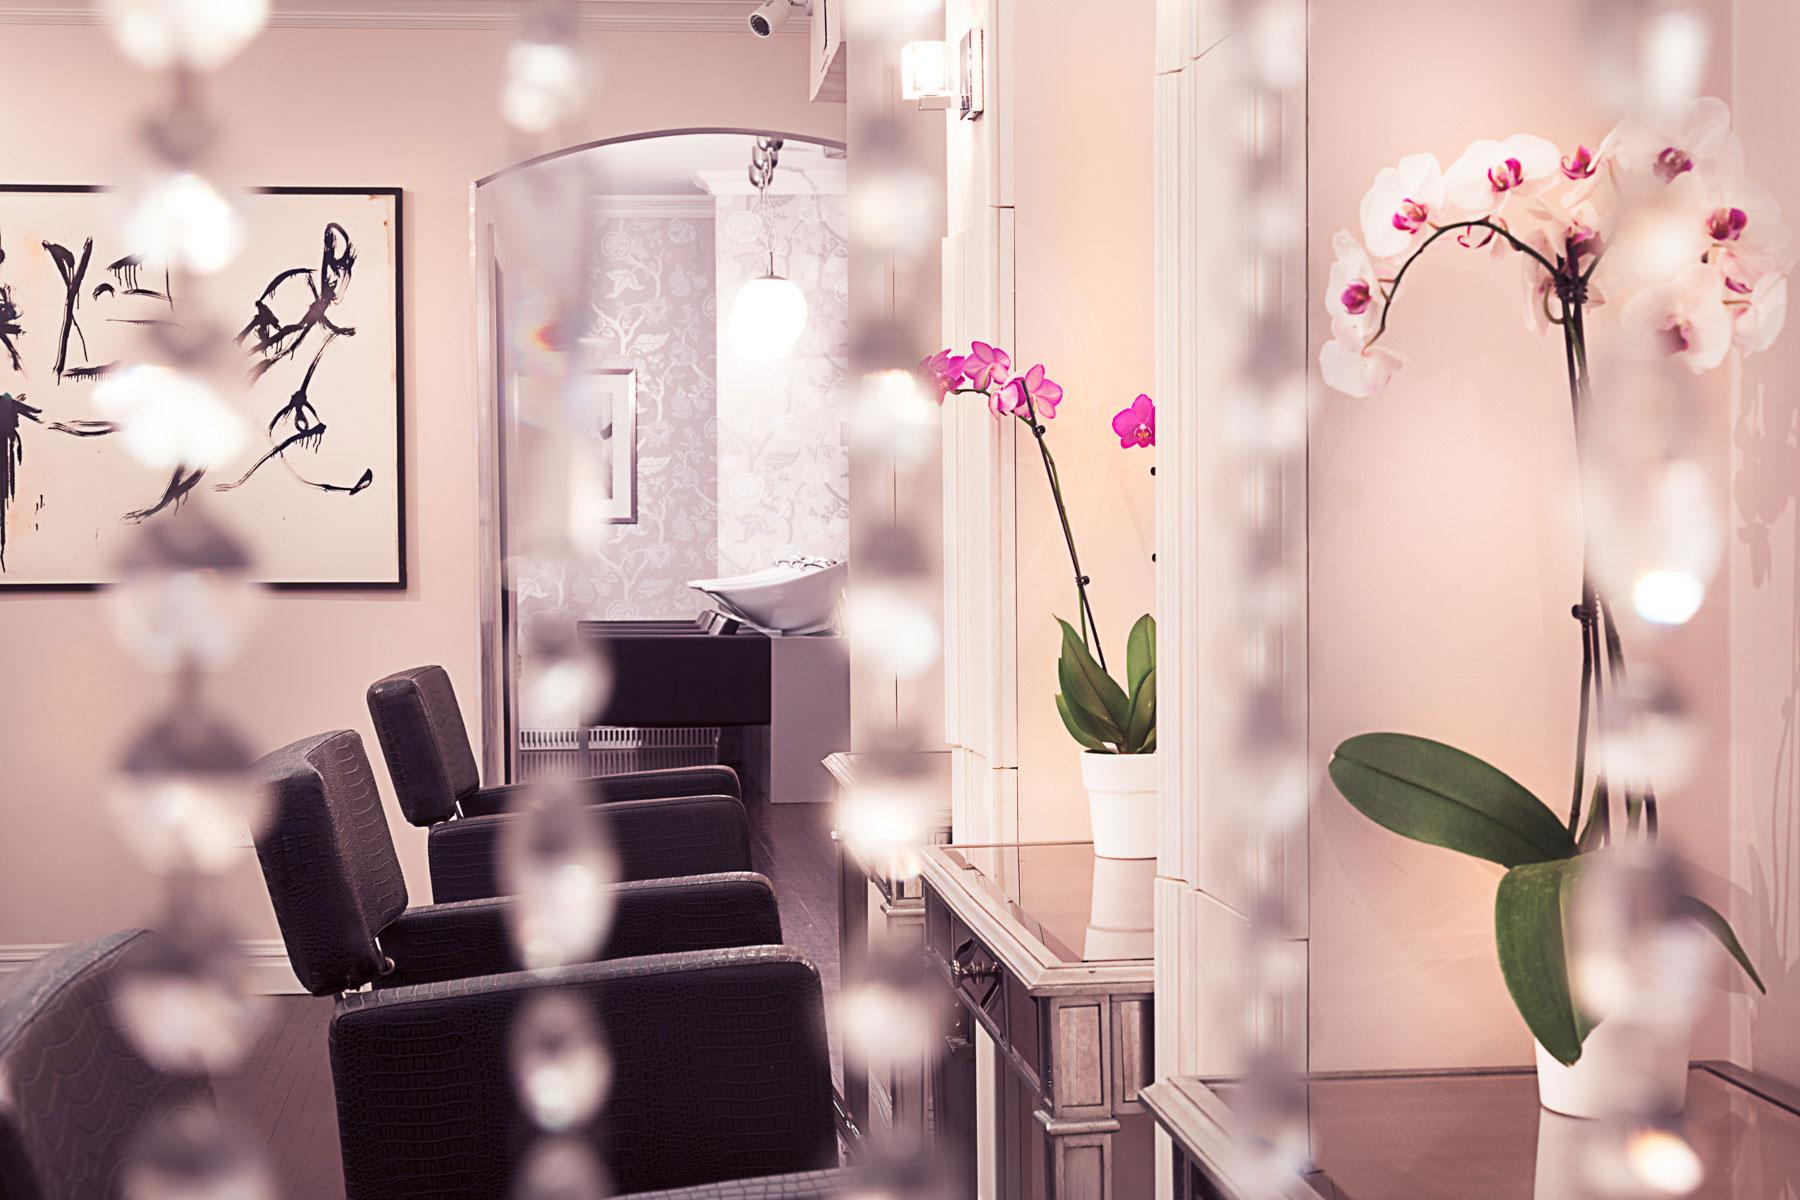 Giannillo Salon Interior Shot 5